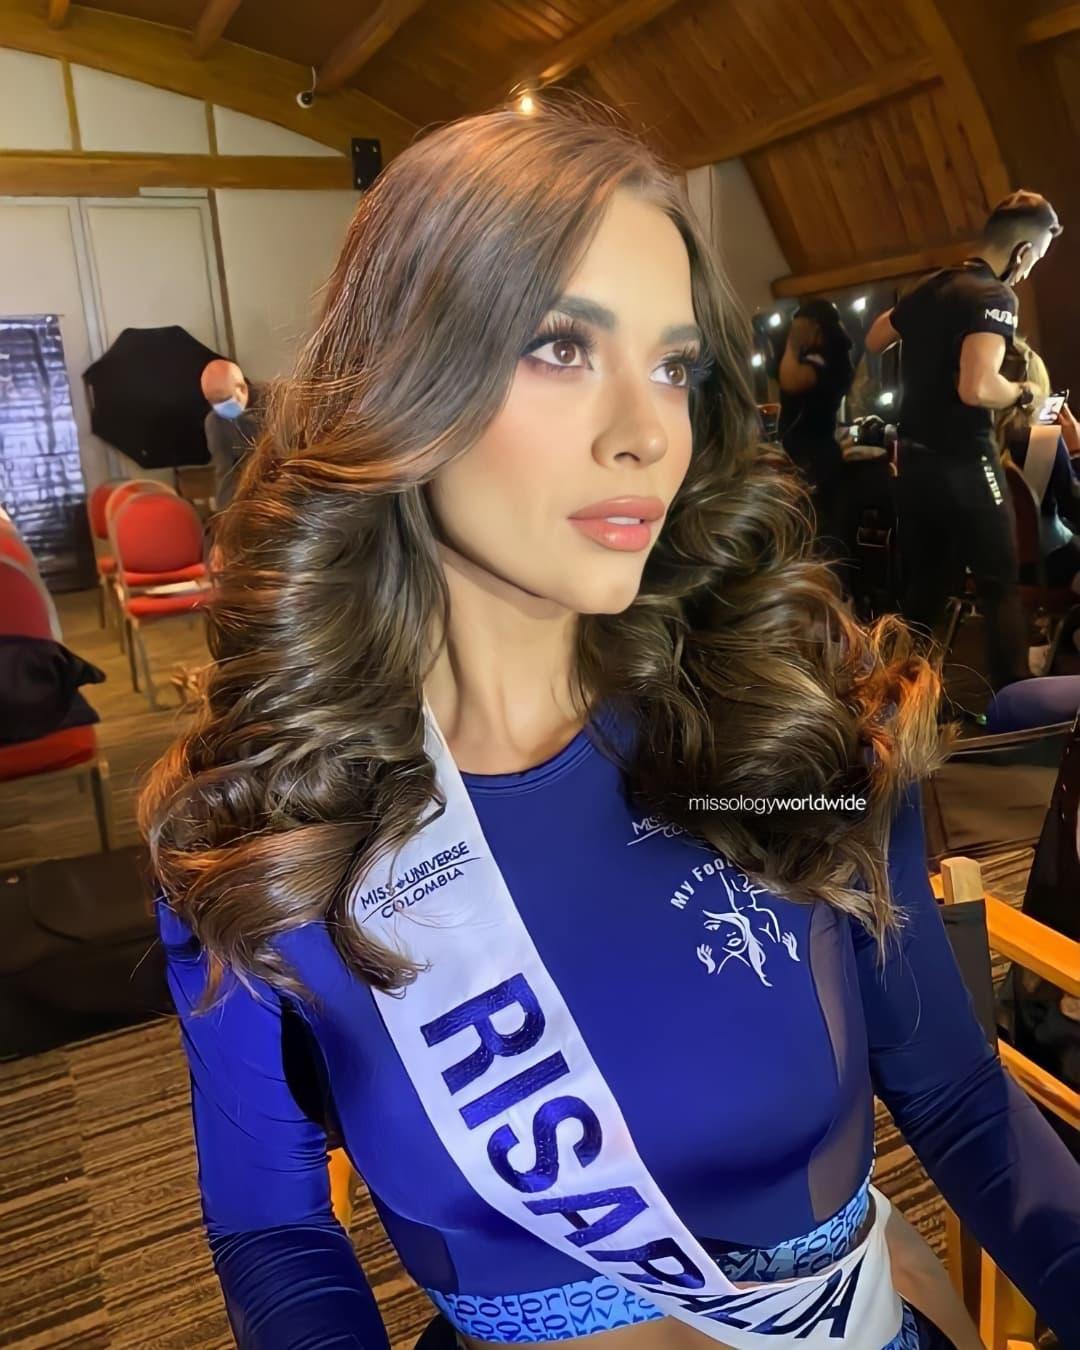 maria alejandra lopez perez, top 2 de miss universe colombia 2021/reyna hispanoamericana 2013/miss caraibes hibiscus 2014/miss colombia mundo 2015. - Página 5 24177611